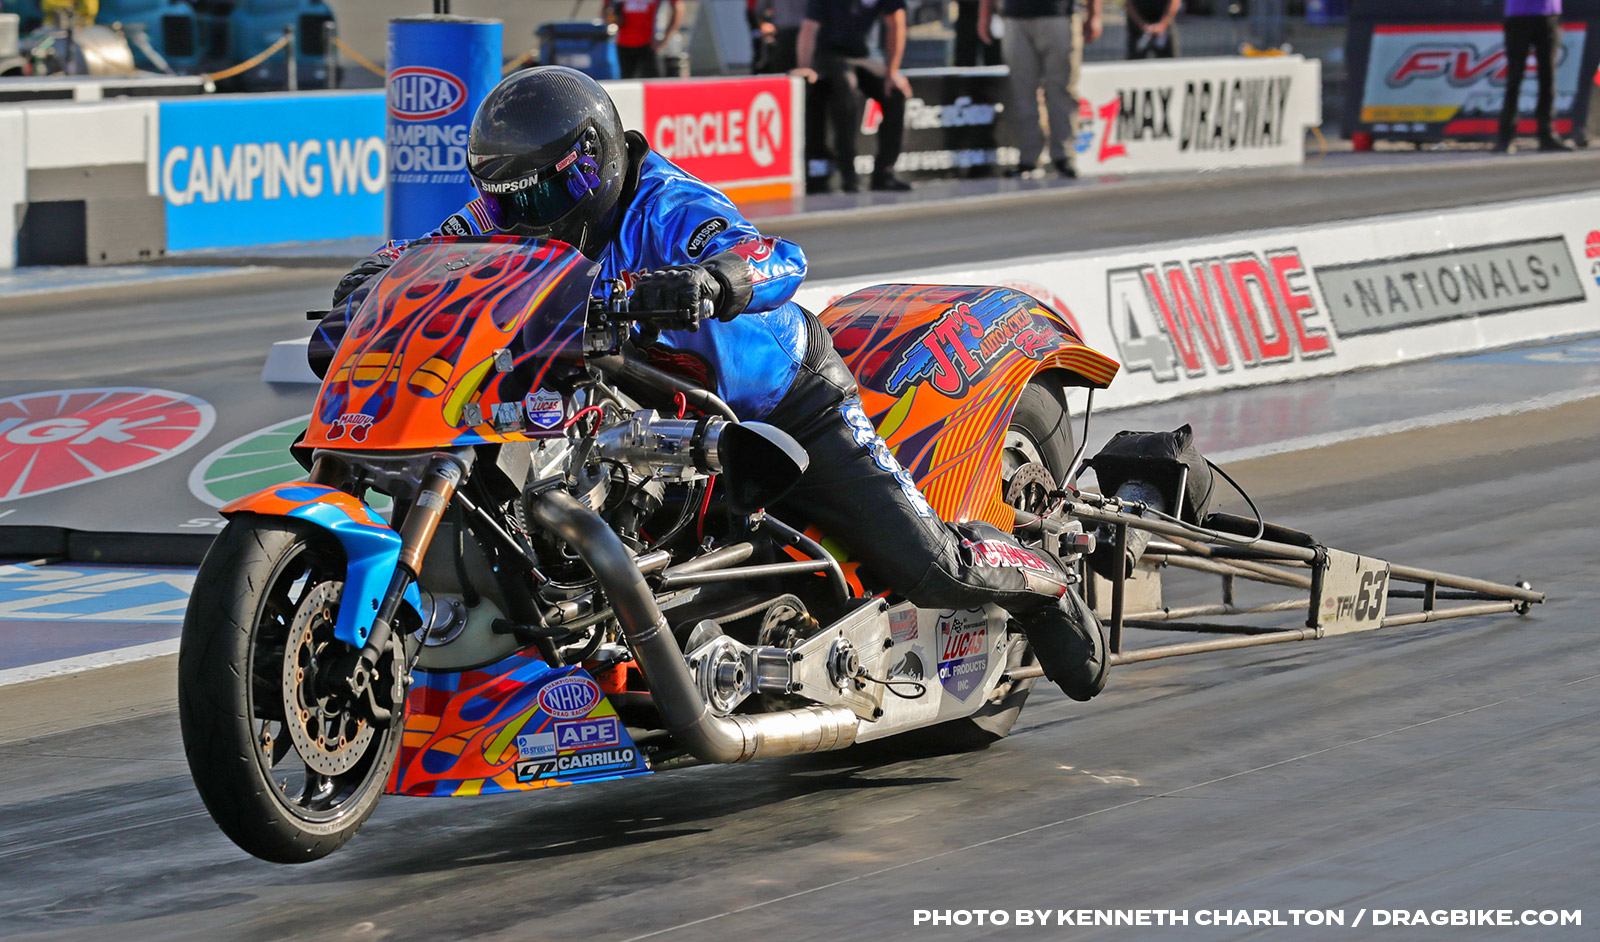 NHRA Top Fuel Harley - Jay Turner